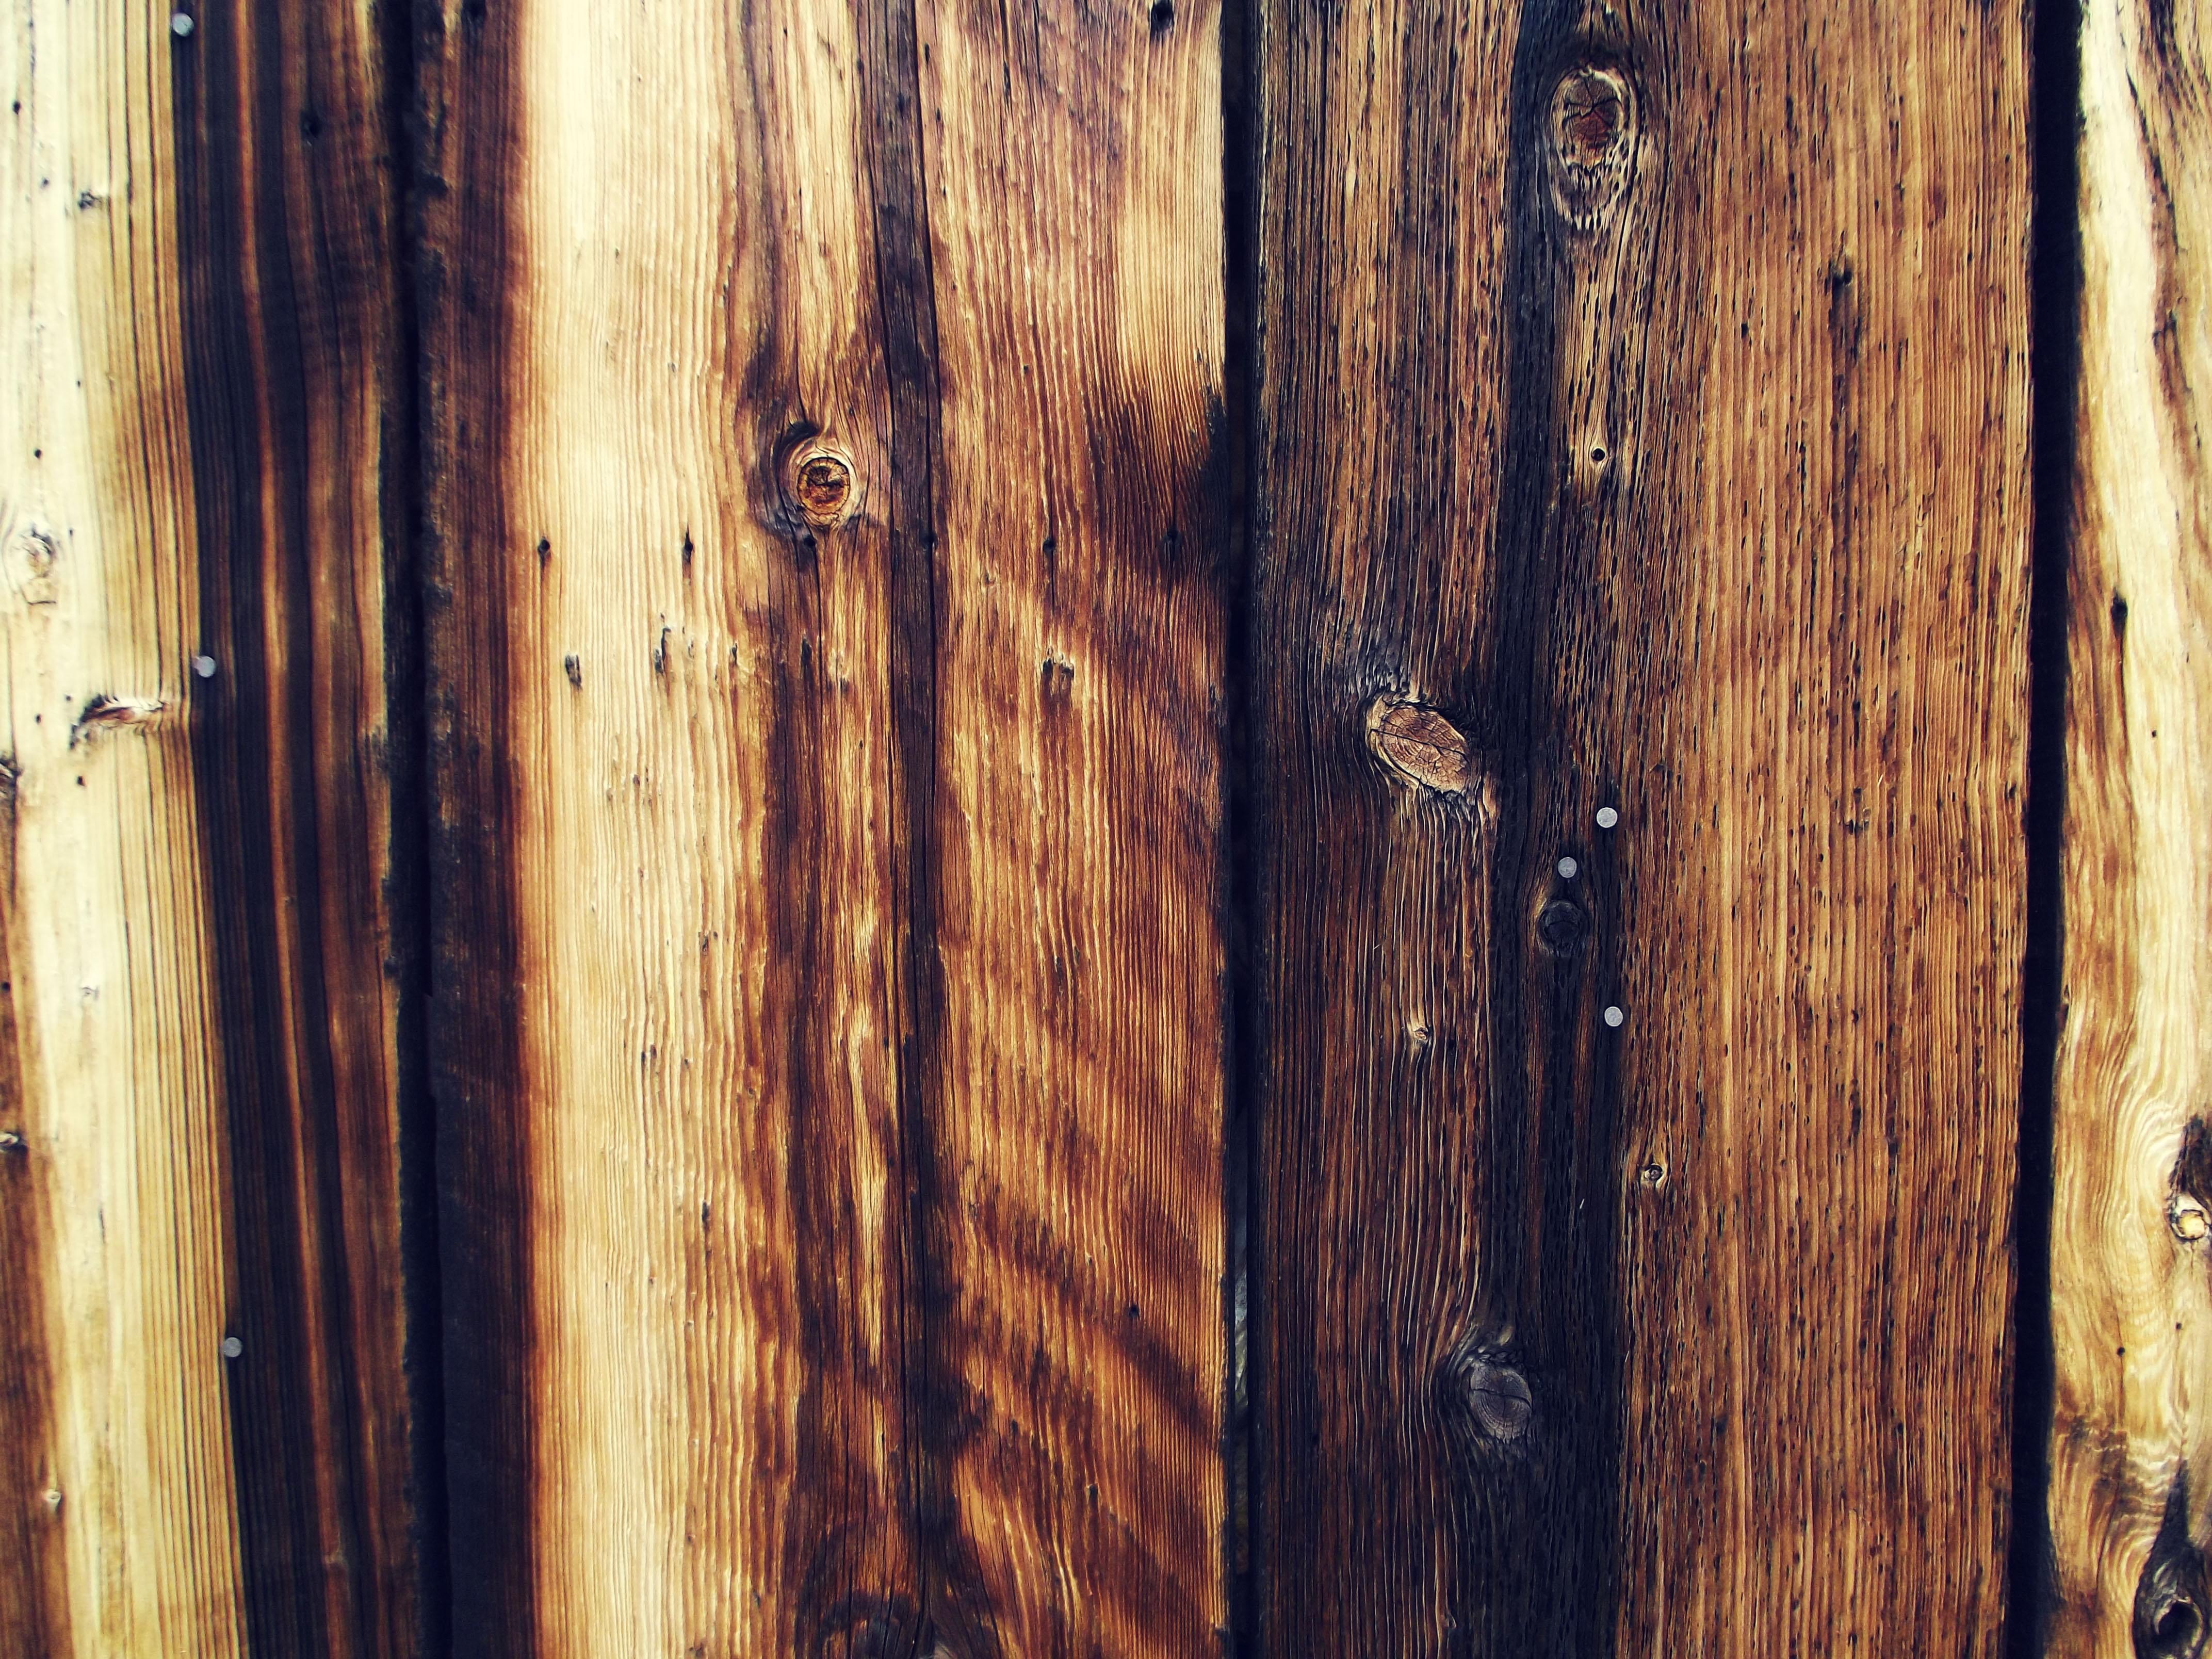 barn wood 1 by ptdesigns on deviantart barn wood 1 by ptdesigns 4288x3216